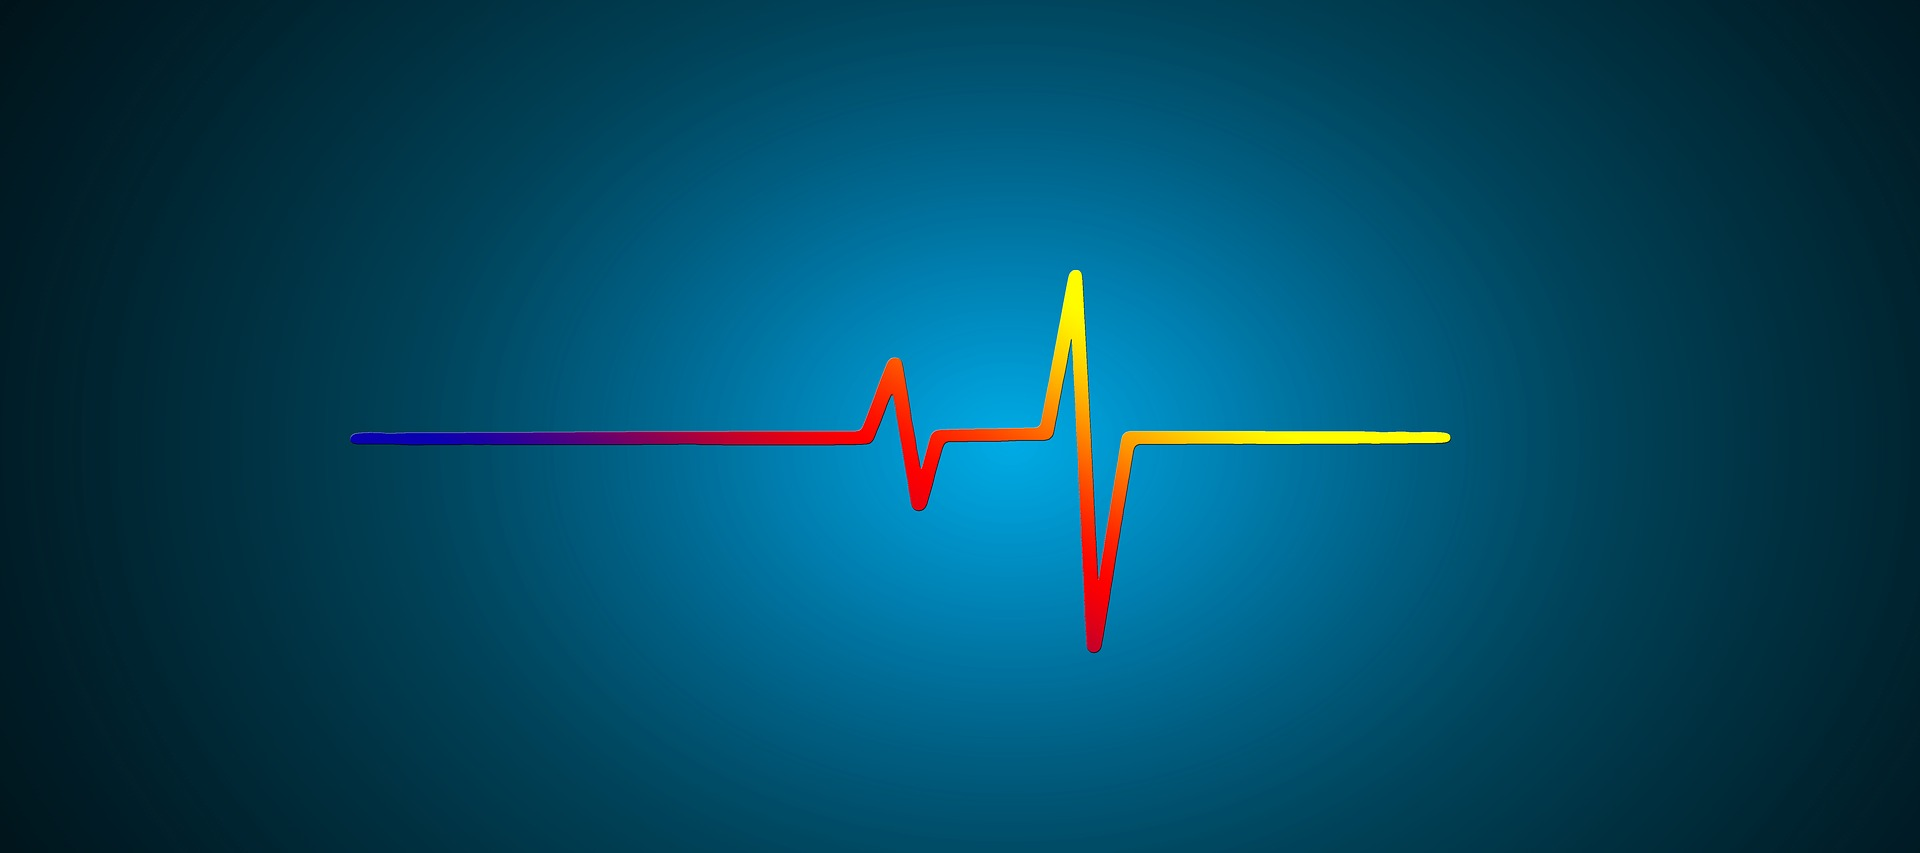 electrocardiogram-3719883_1920